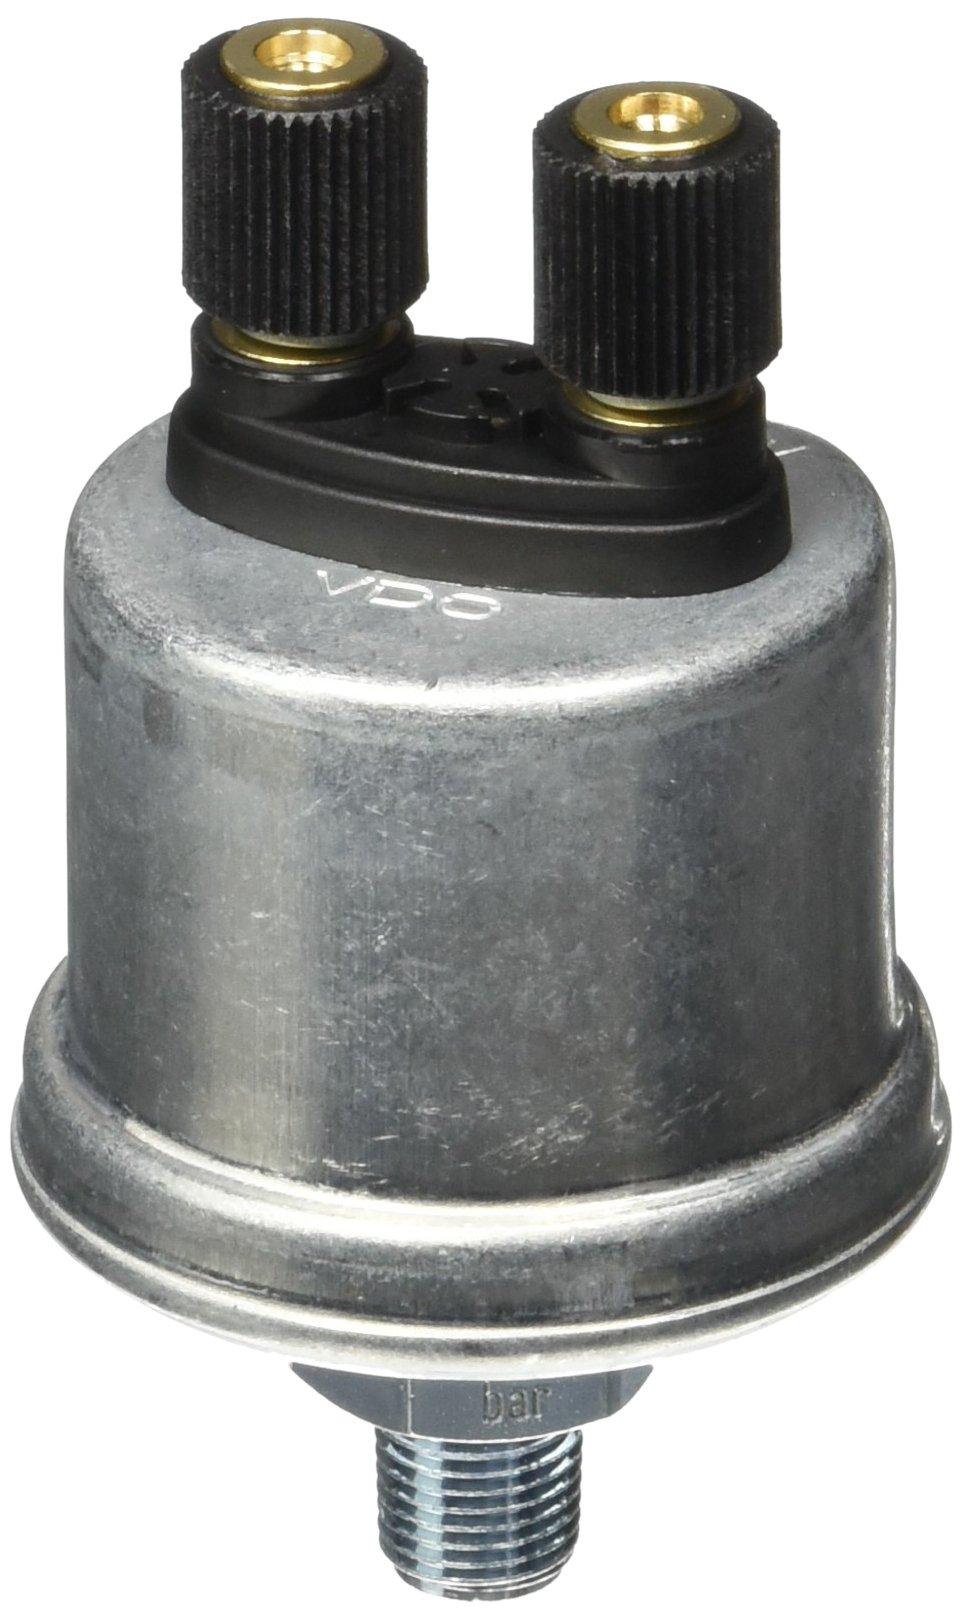 VDO 360 006 Gauge Pressure Sender by VDO